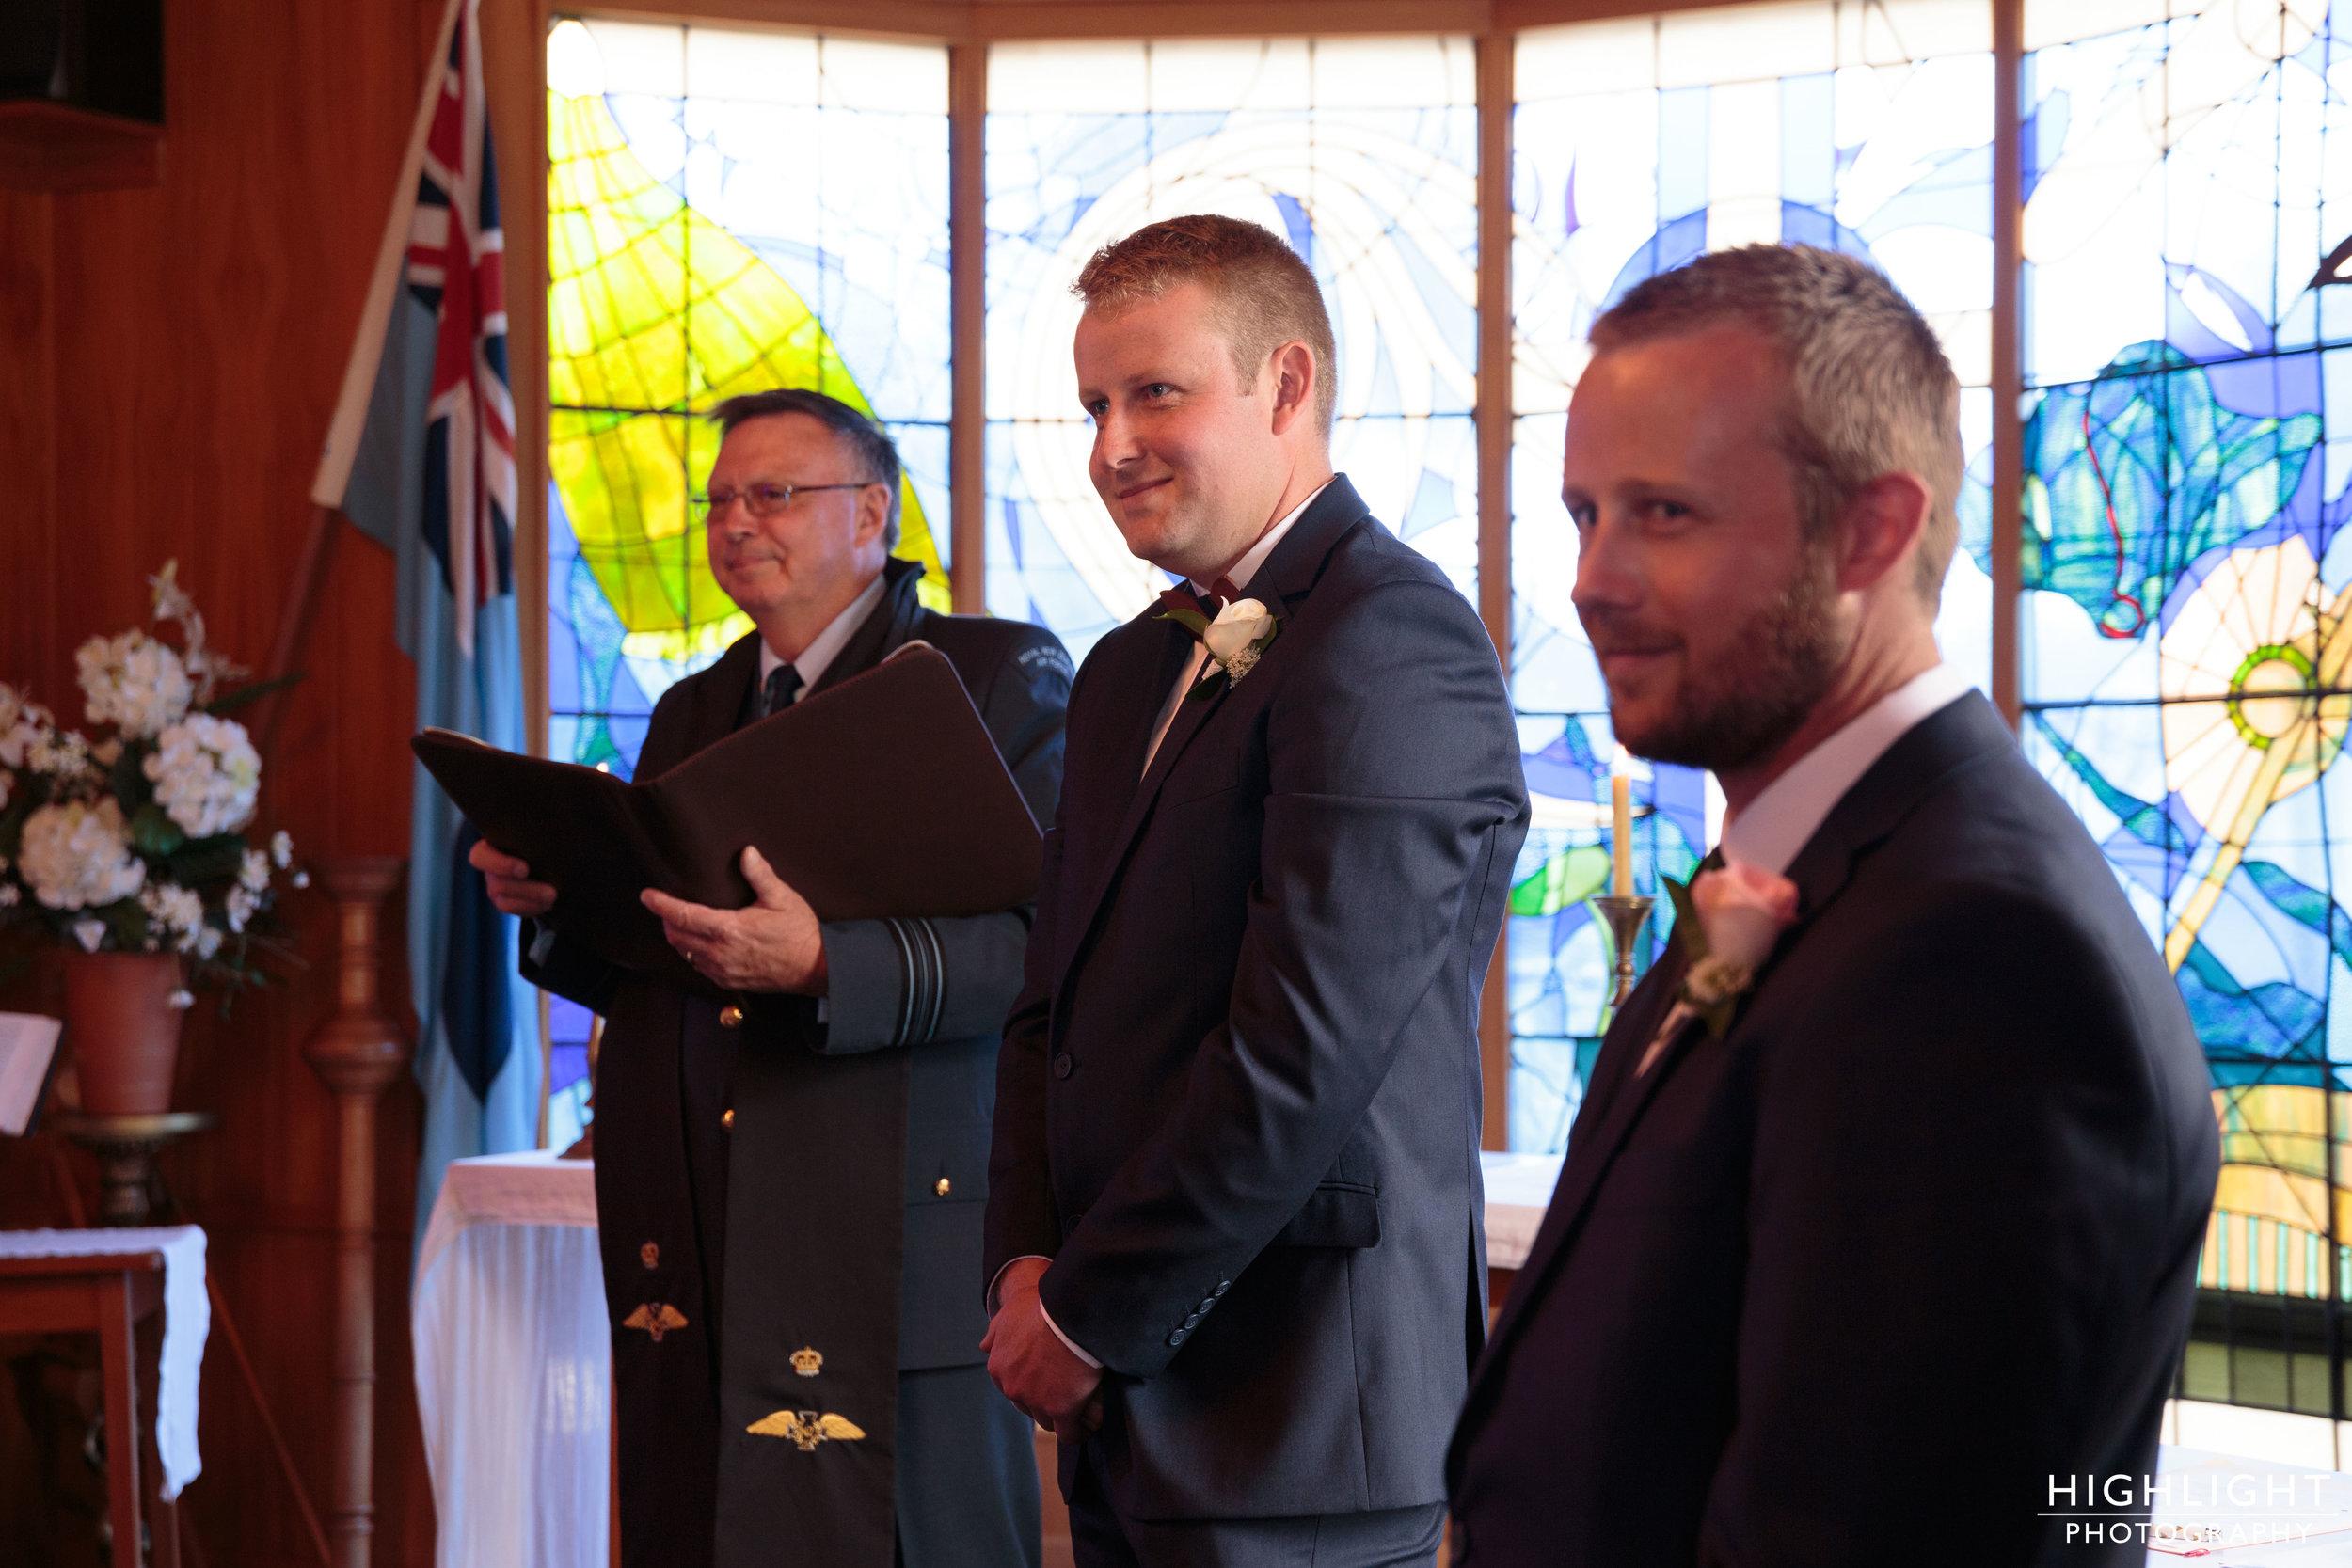 JM-2017-Highlight-wedding-photography-palmerston-north-new-zealand-50.jpg